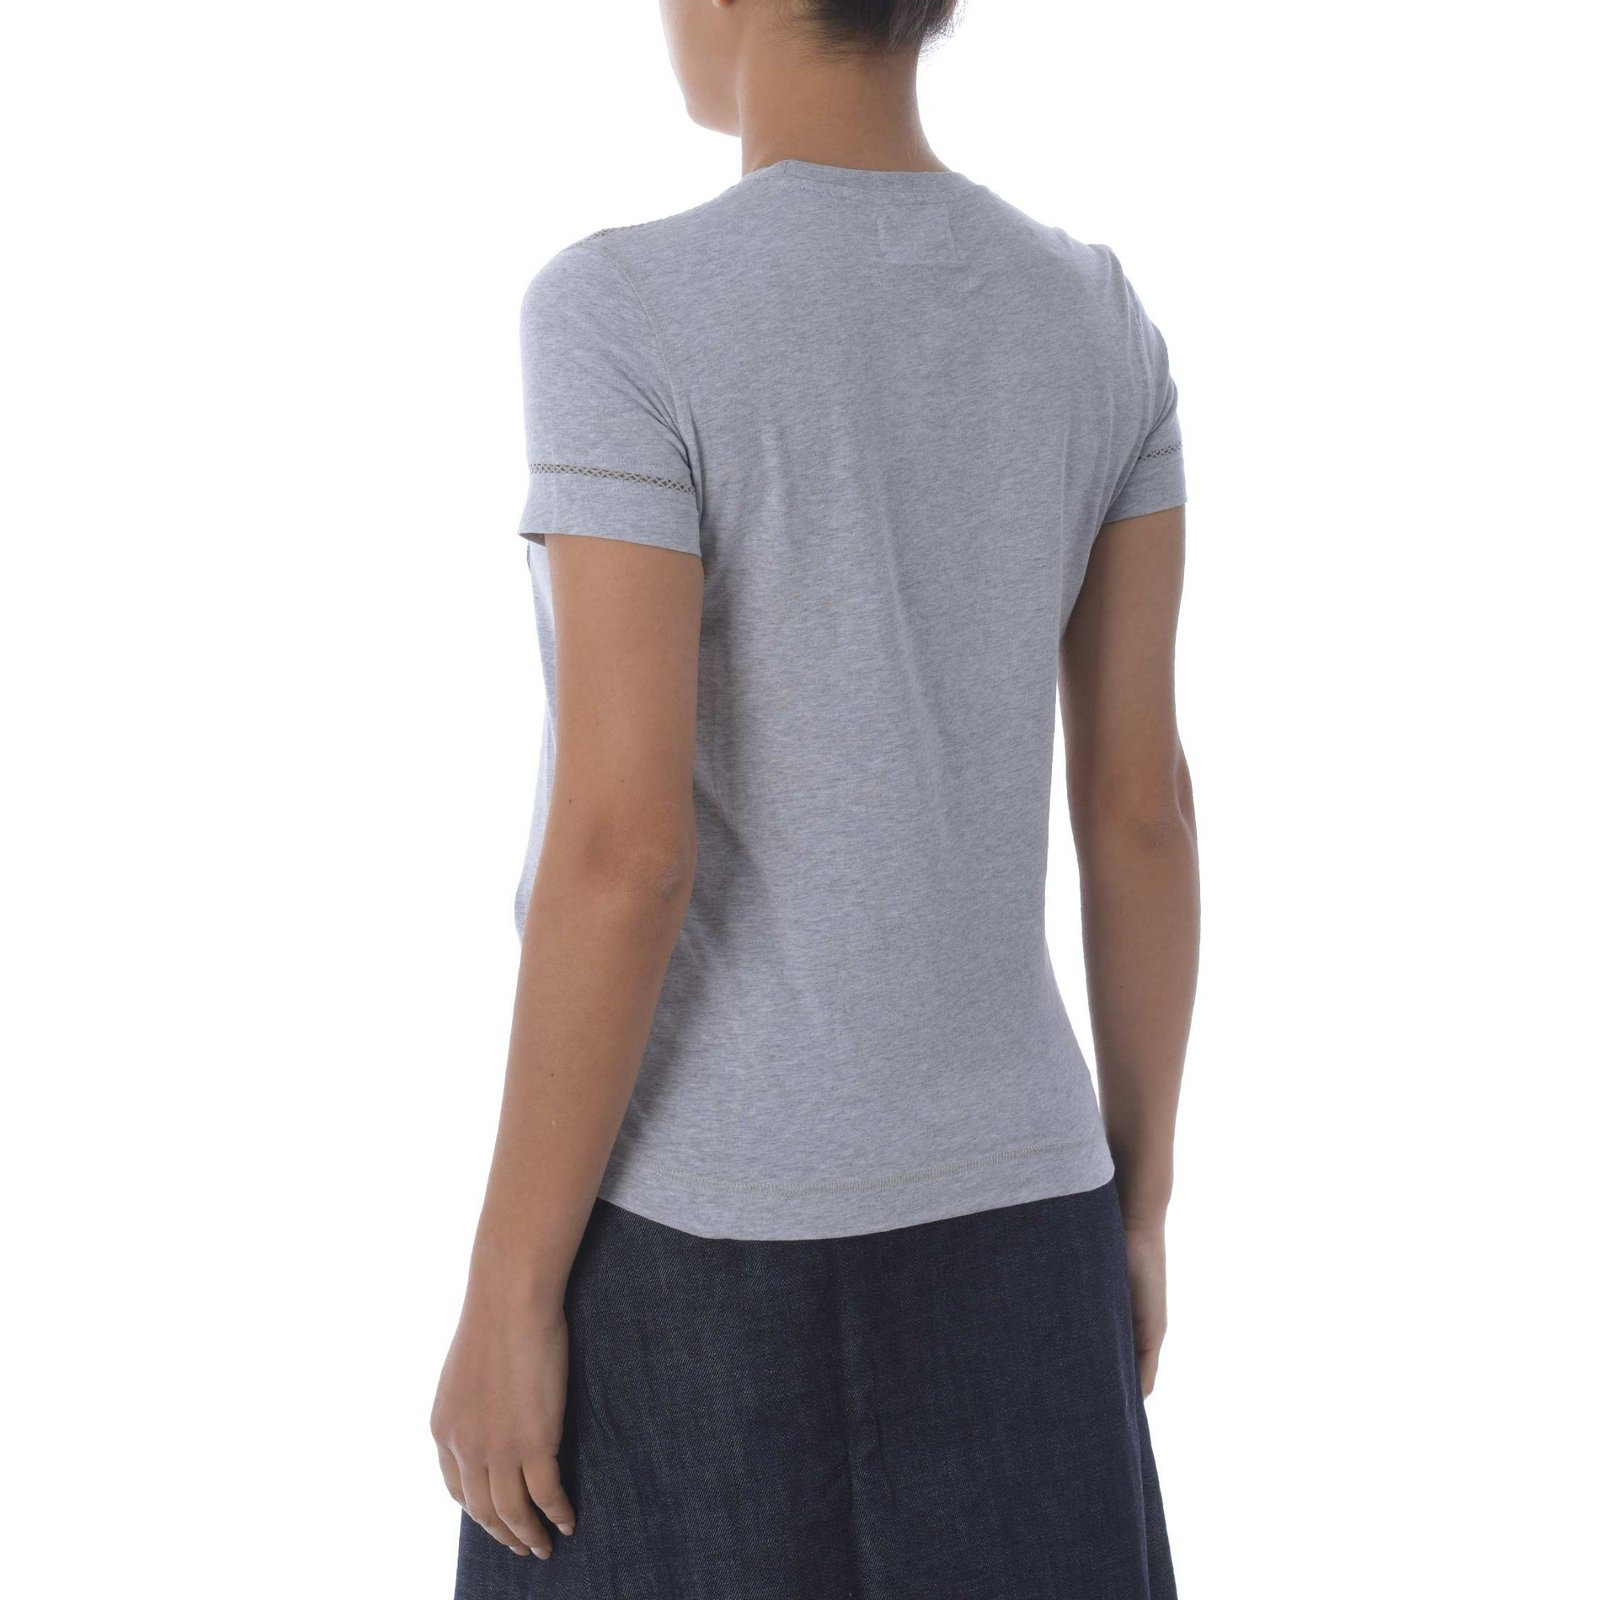 ae7f9d7c4c1 Kenzo t shirt memento Tops Cotton Grey ref.83557 - Joli Closet